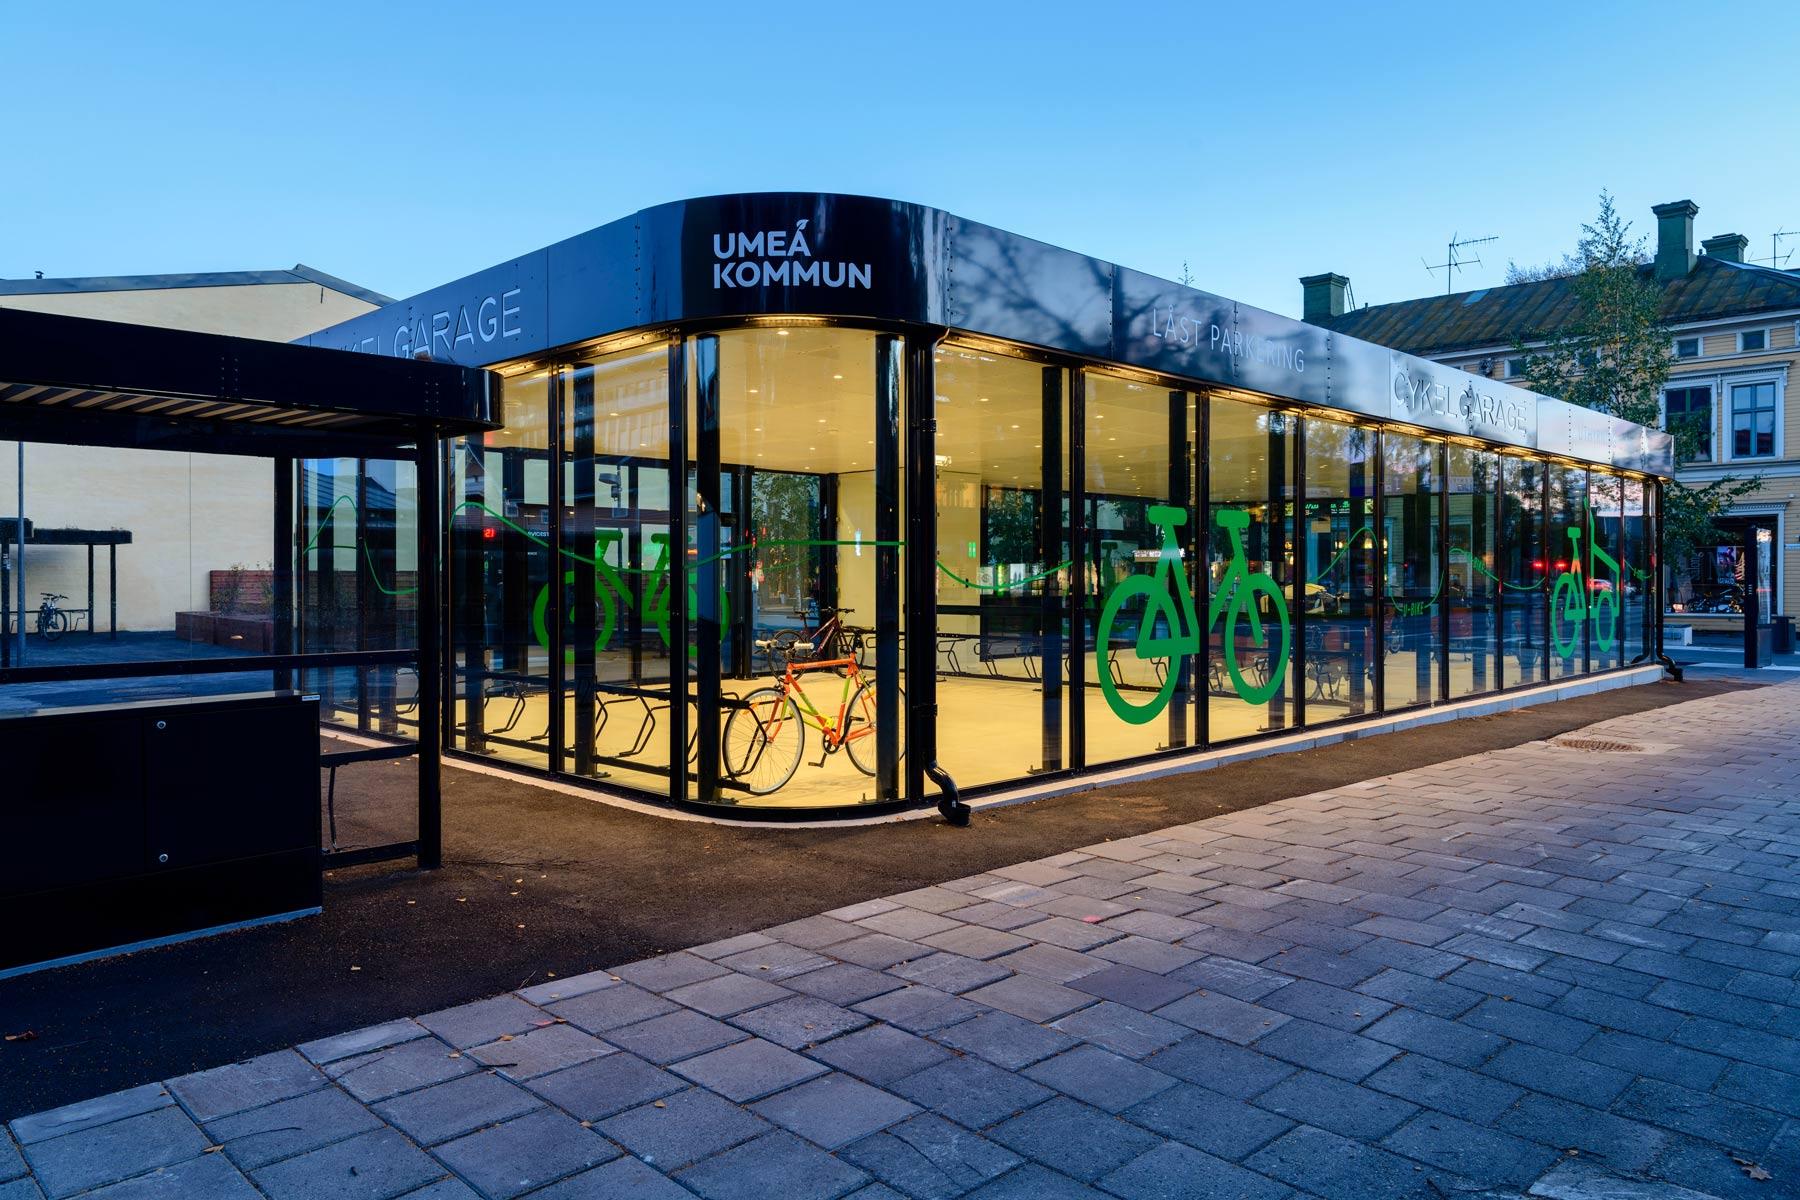 Sykkelhus FLOW i Umeå Sverige med runde hjørner og vegger helt i glass